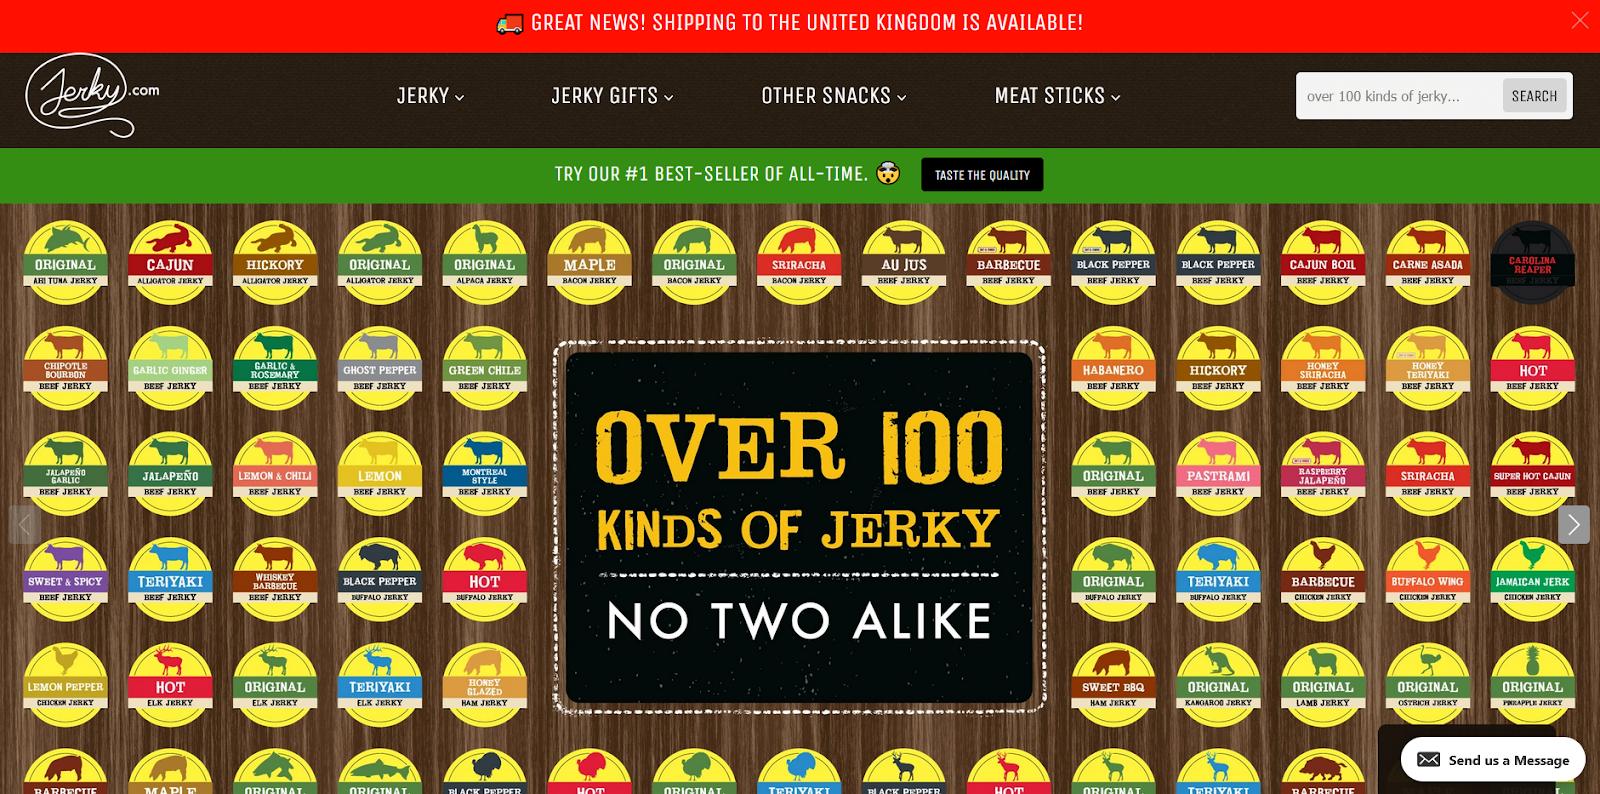 Very large image on Jerky.com